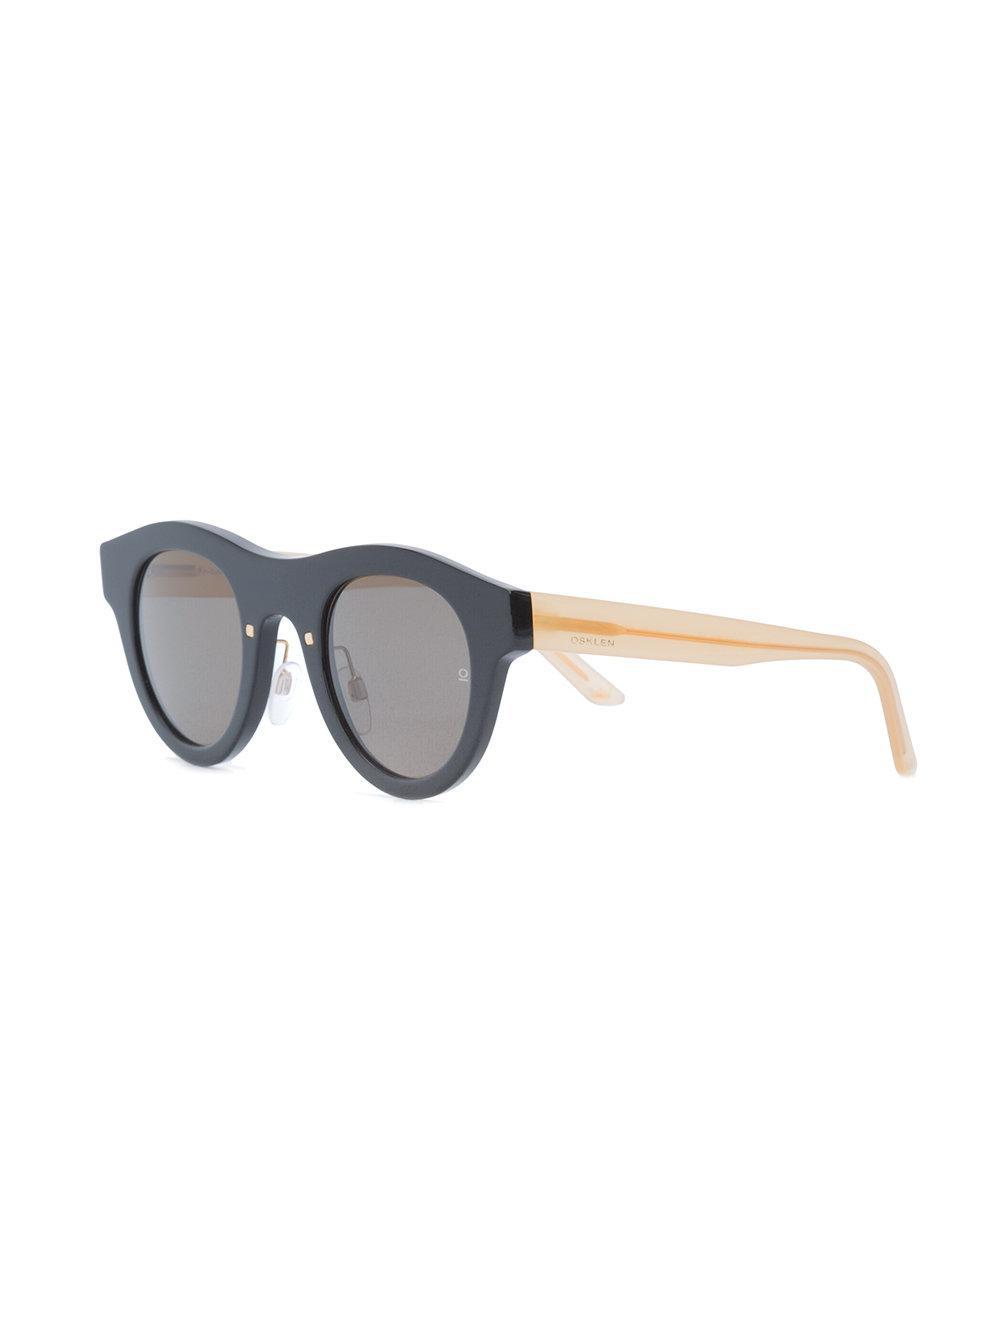 957f303d52f Osklen Ipanema V Sunglasses in Black - Lyst